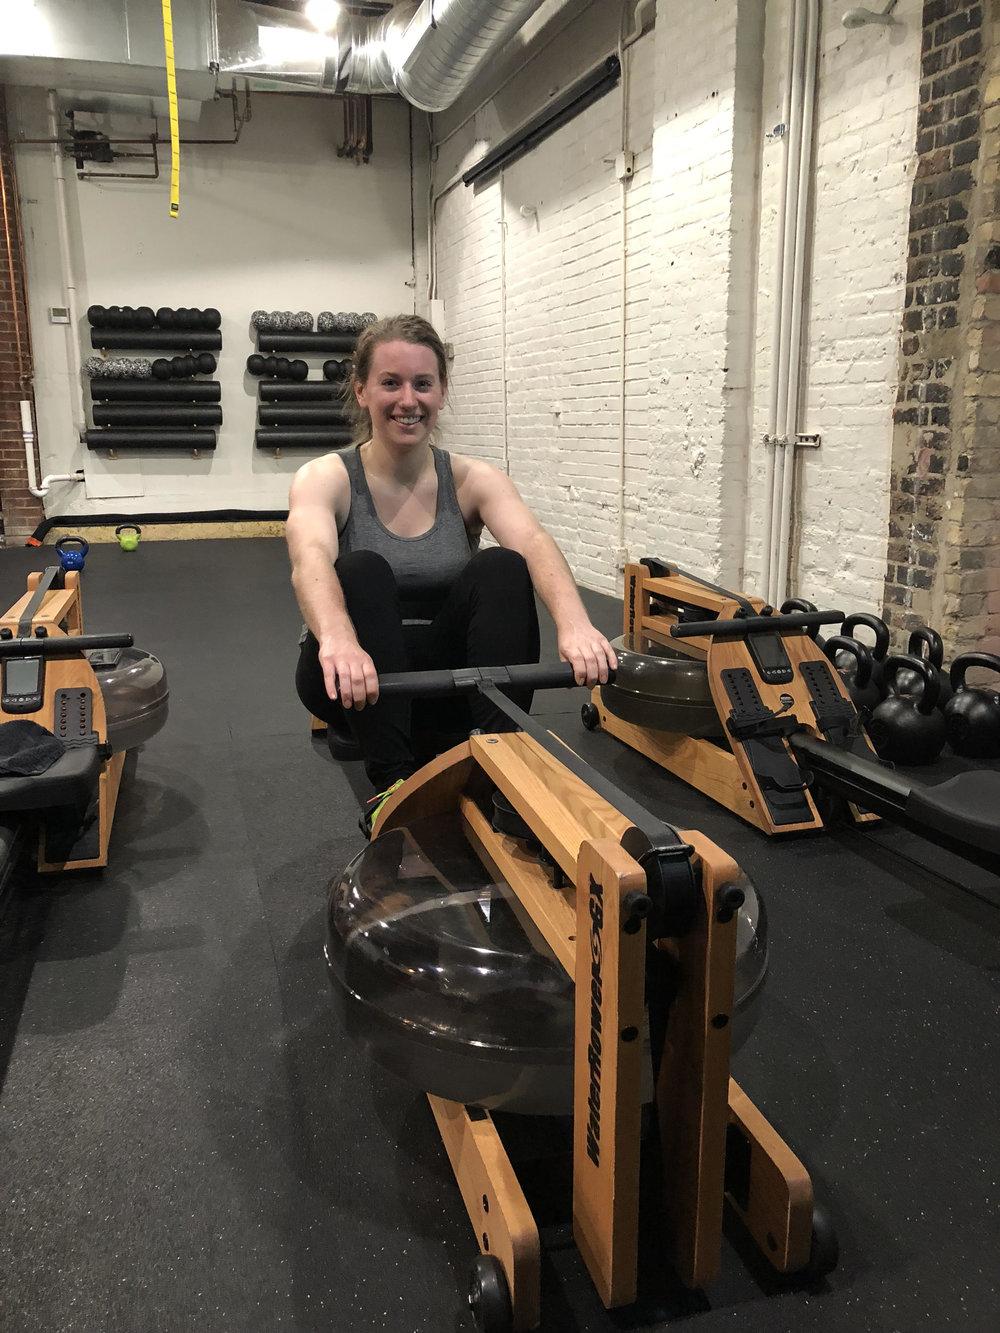 Danielle Rowing.jpg